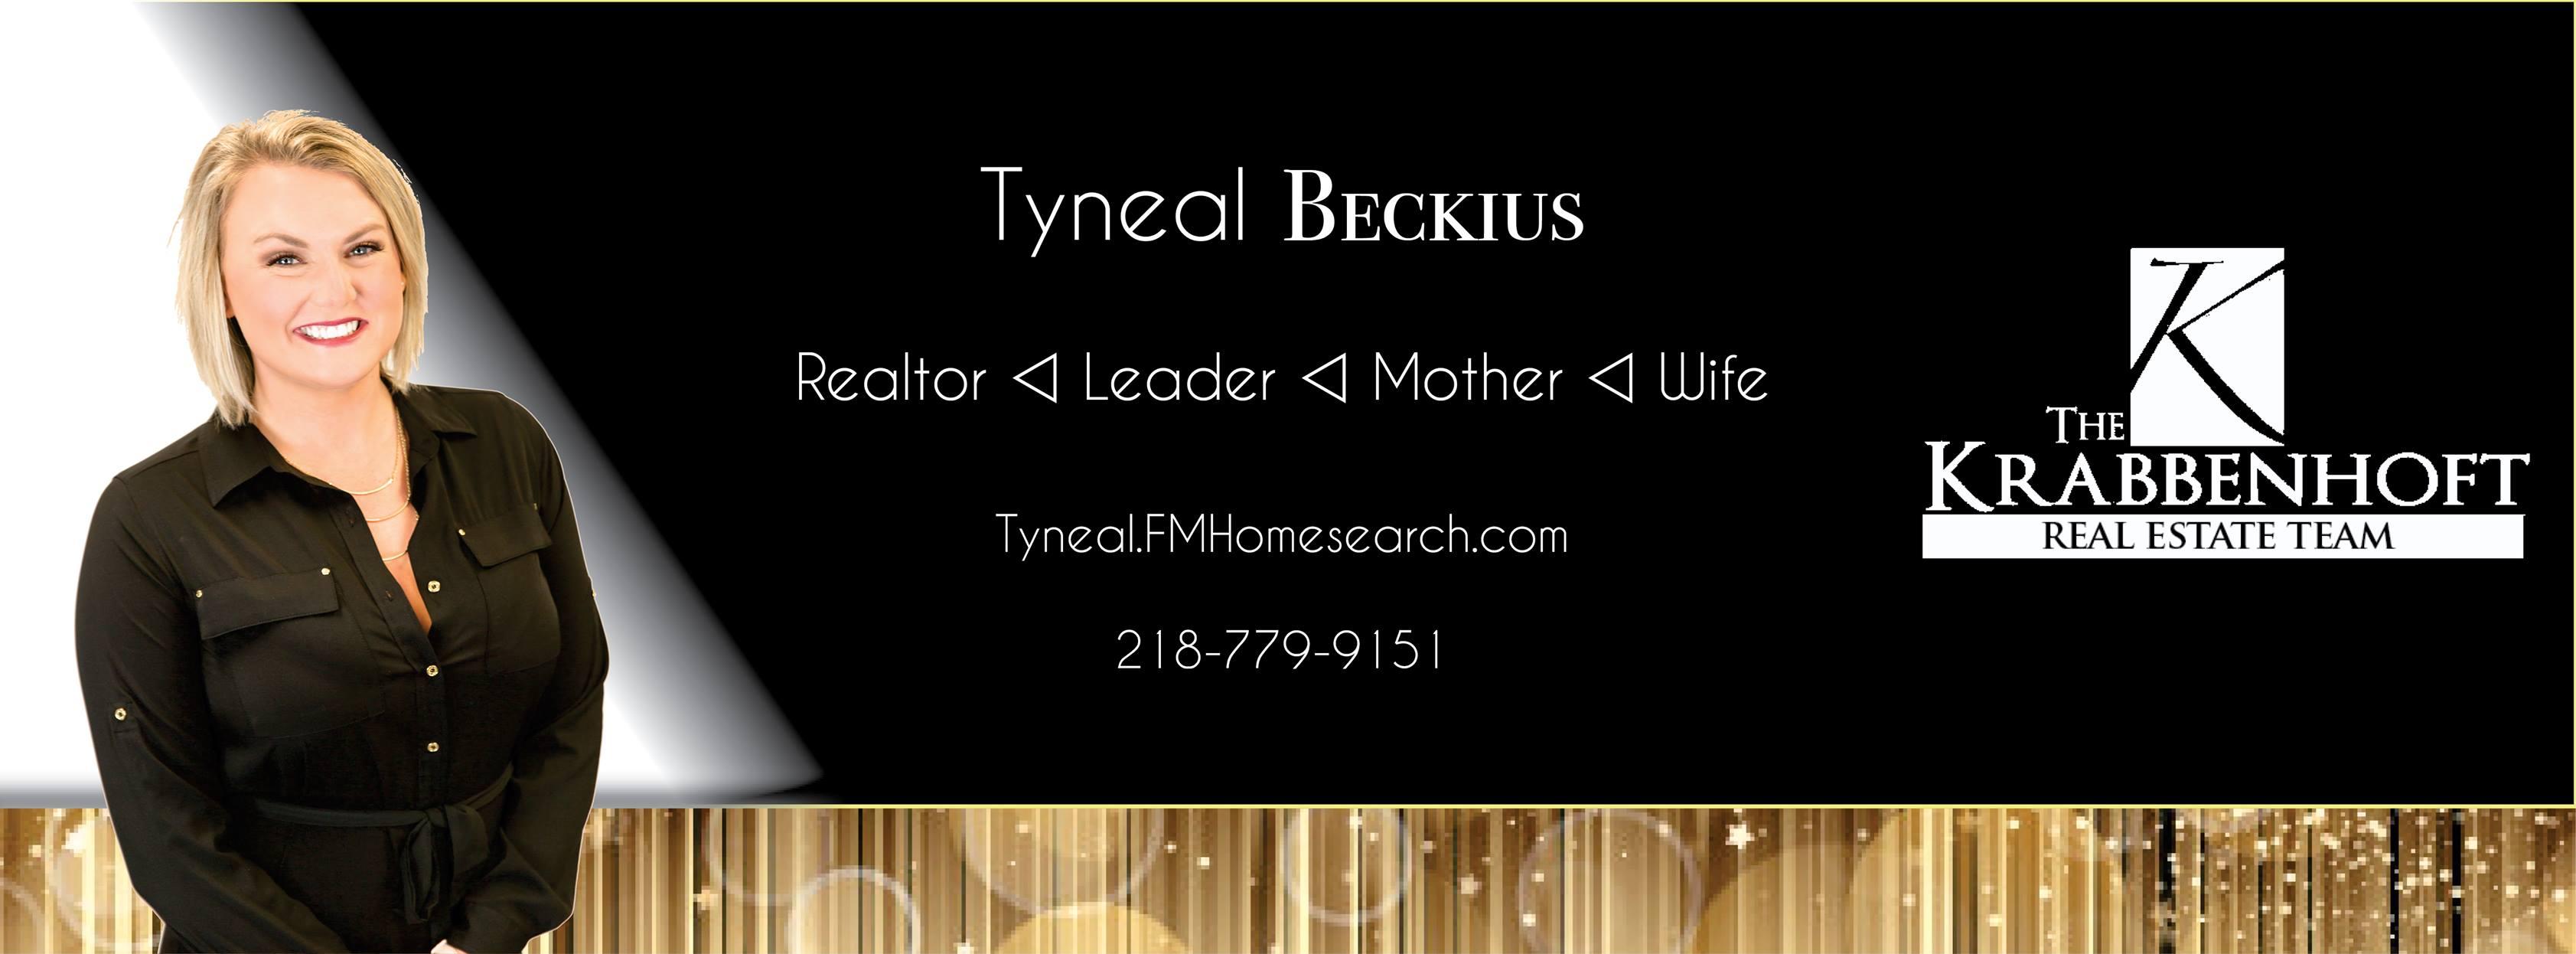 Tyneal FBook banner.jpg